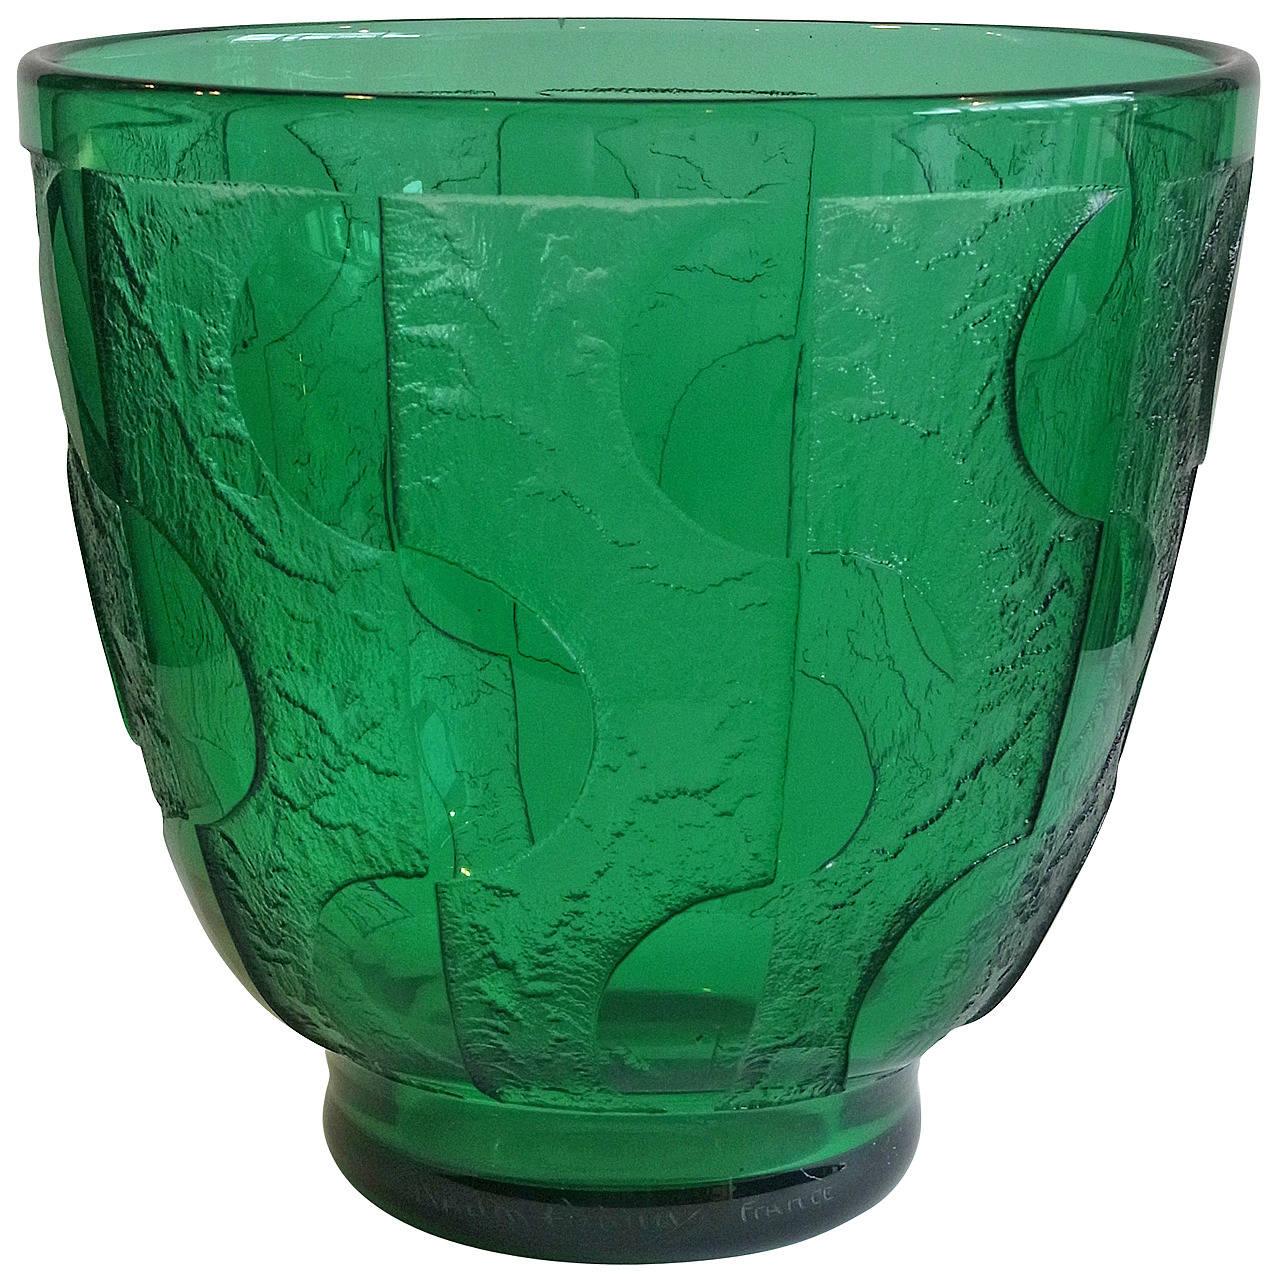 Daum Art Deco Green Geometric Decor Acid Etched Glass Vase